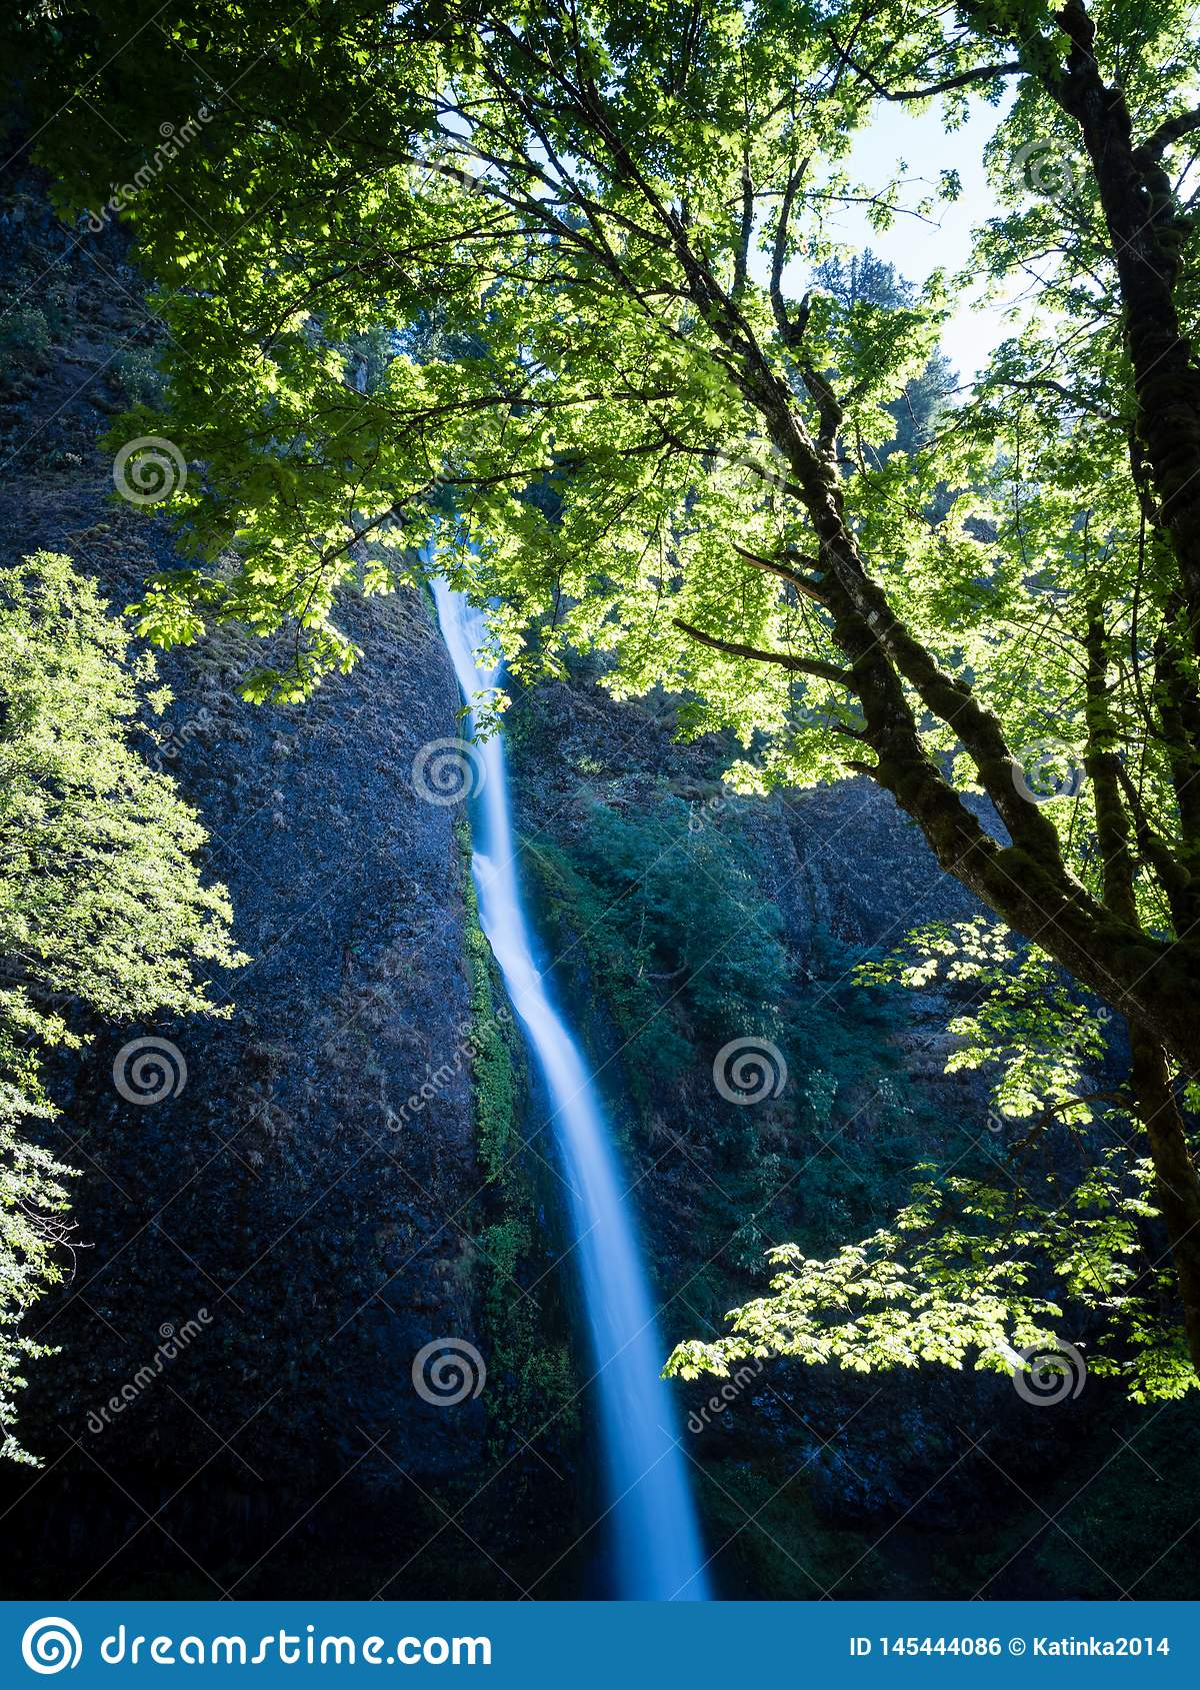 Horsetail Falls in Columbia River Gorge, Oregon, USA